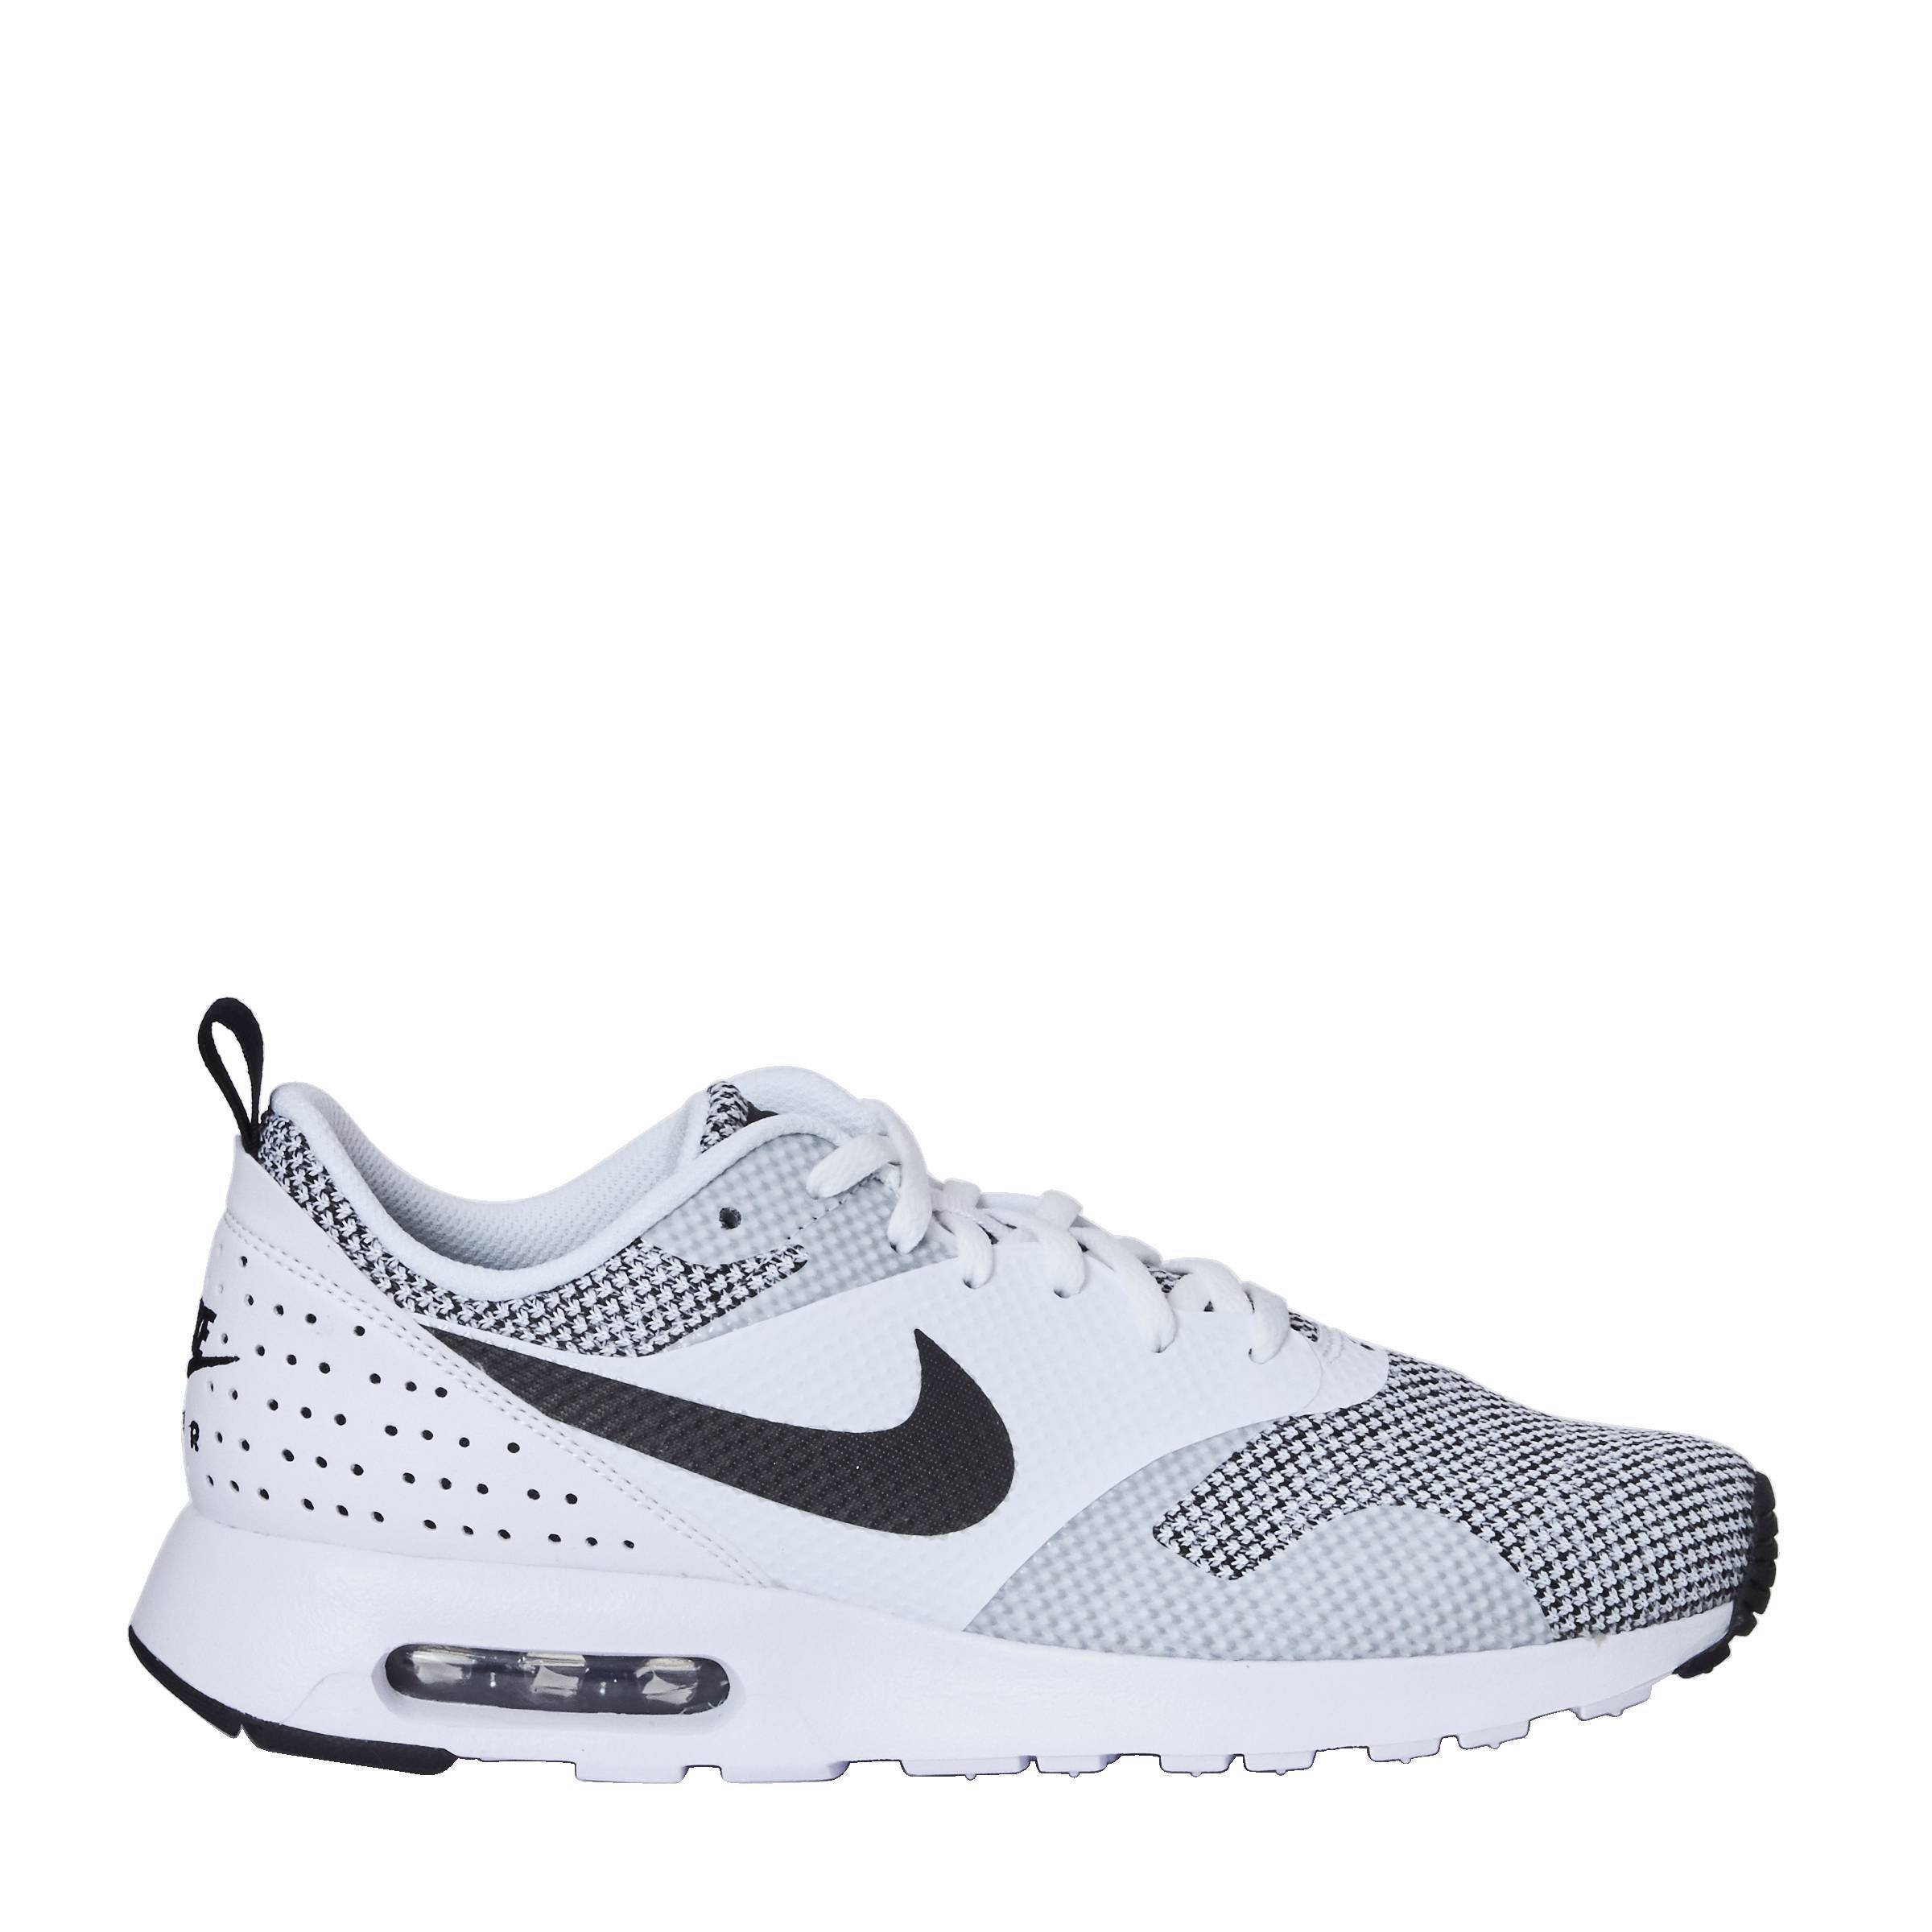 437fa16448f Nike Air Max Tavas sneakers | wehkamp